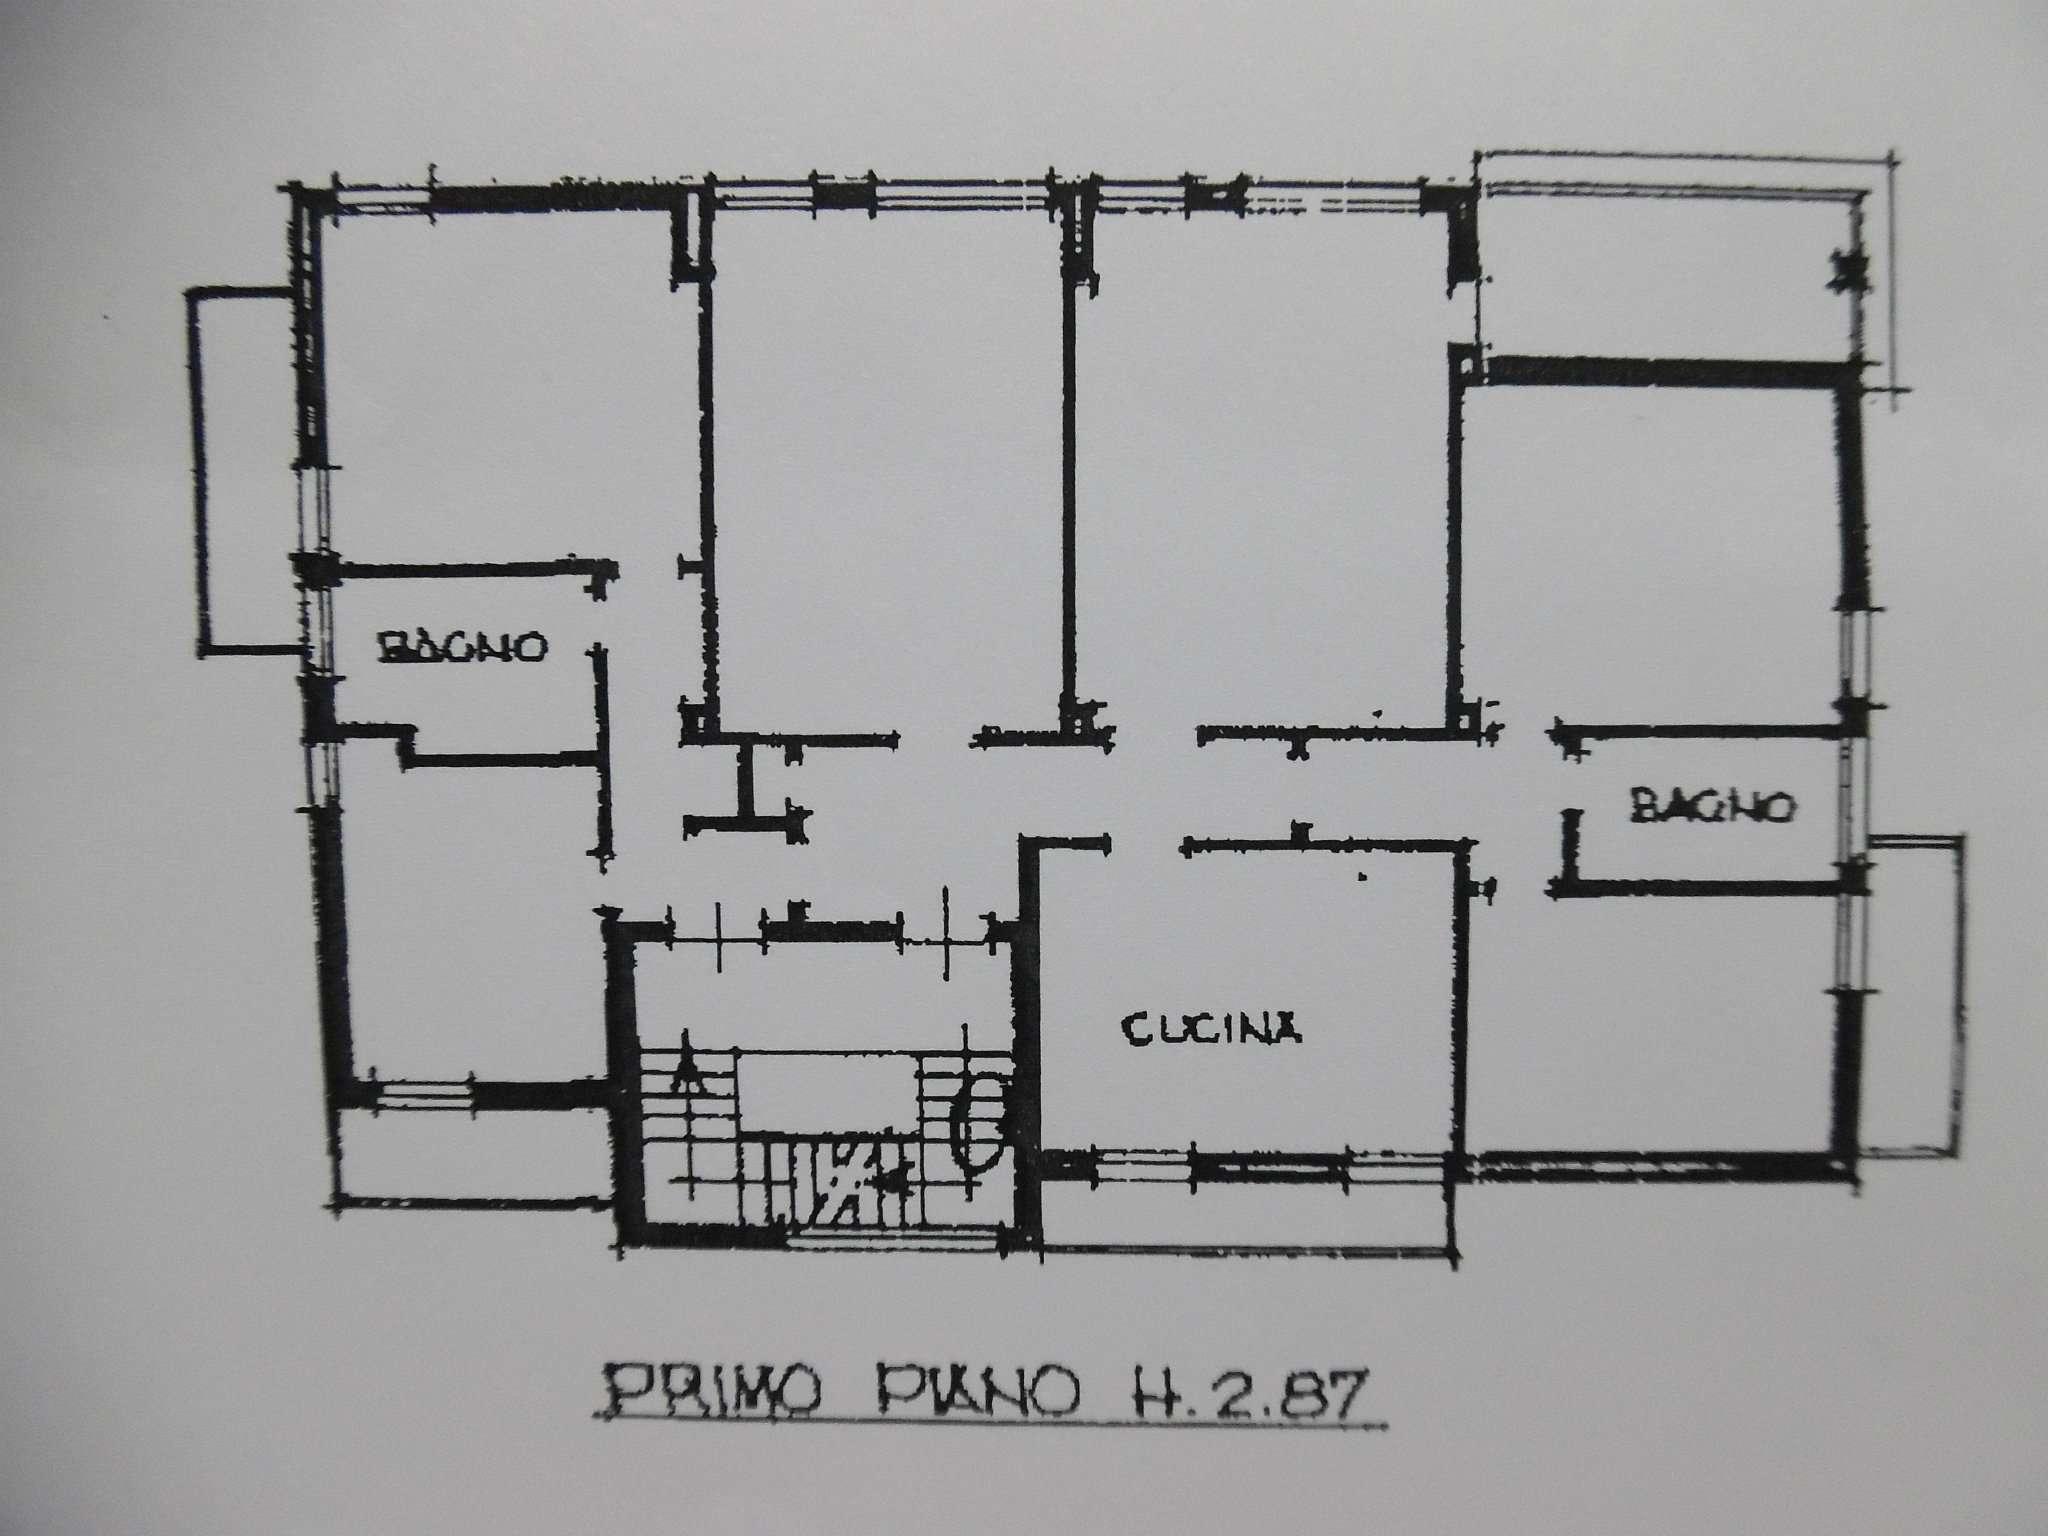 Appartamento, ROMA, 0, Vendita - Camugnano